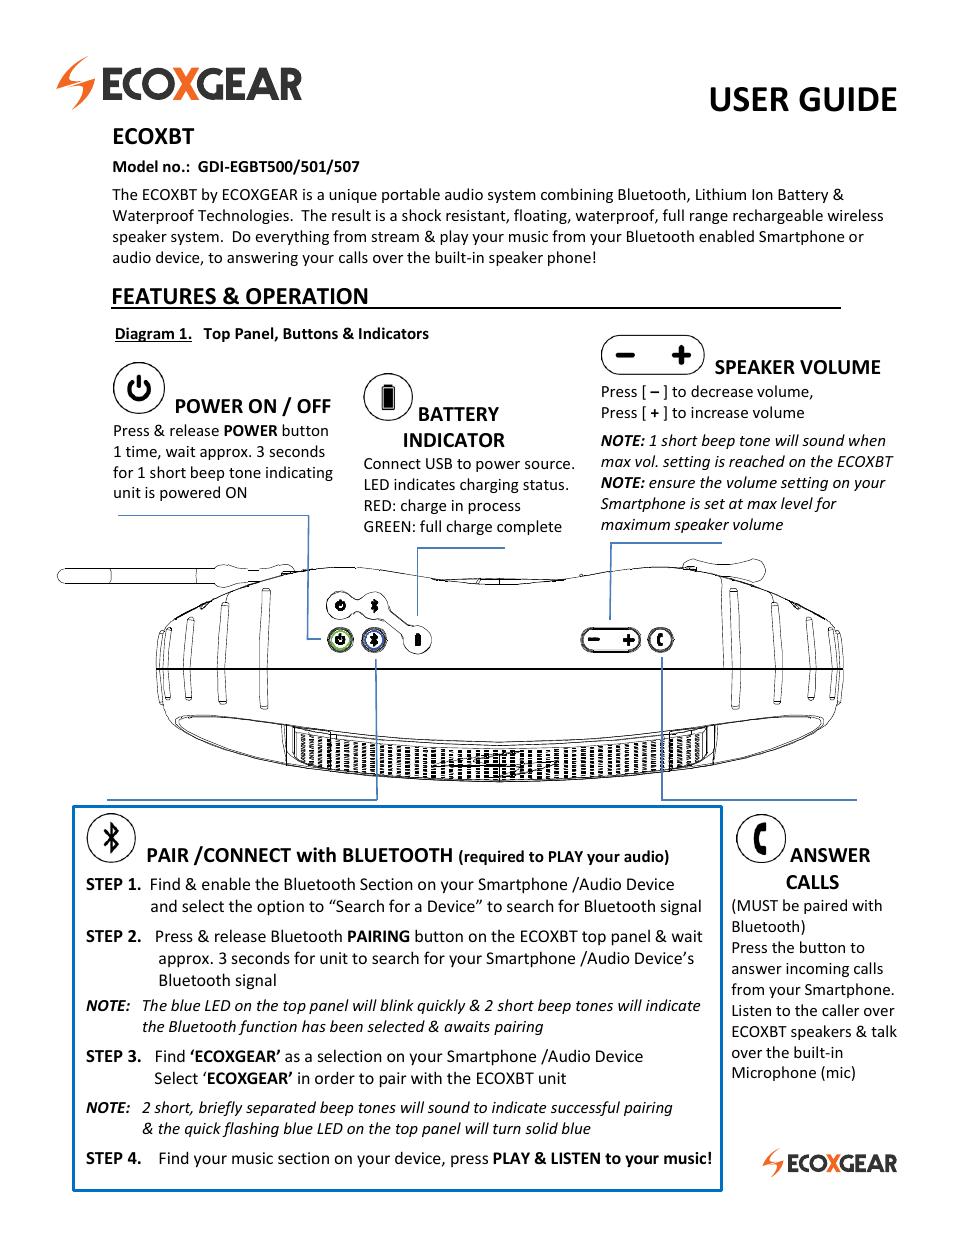 ECOXGEAR EGBT500-501-507: ECOXBT User Manual | 4 pages